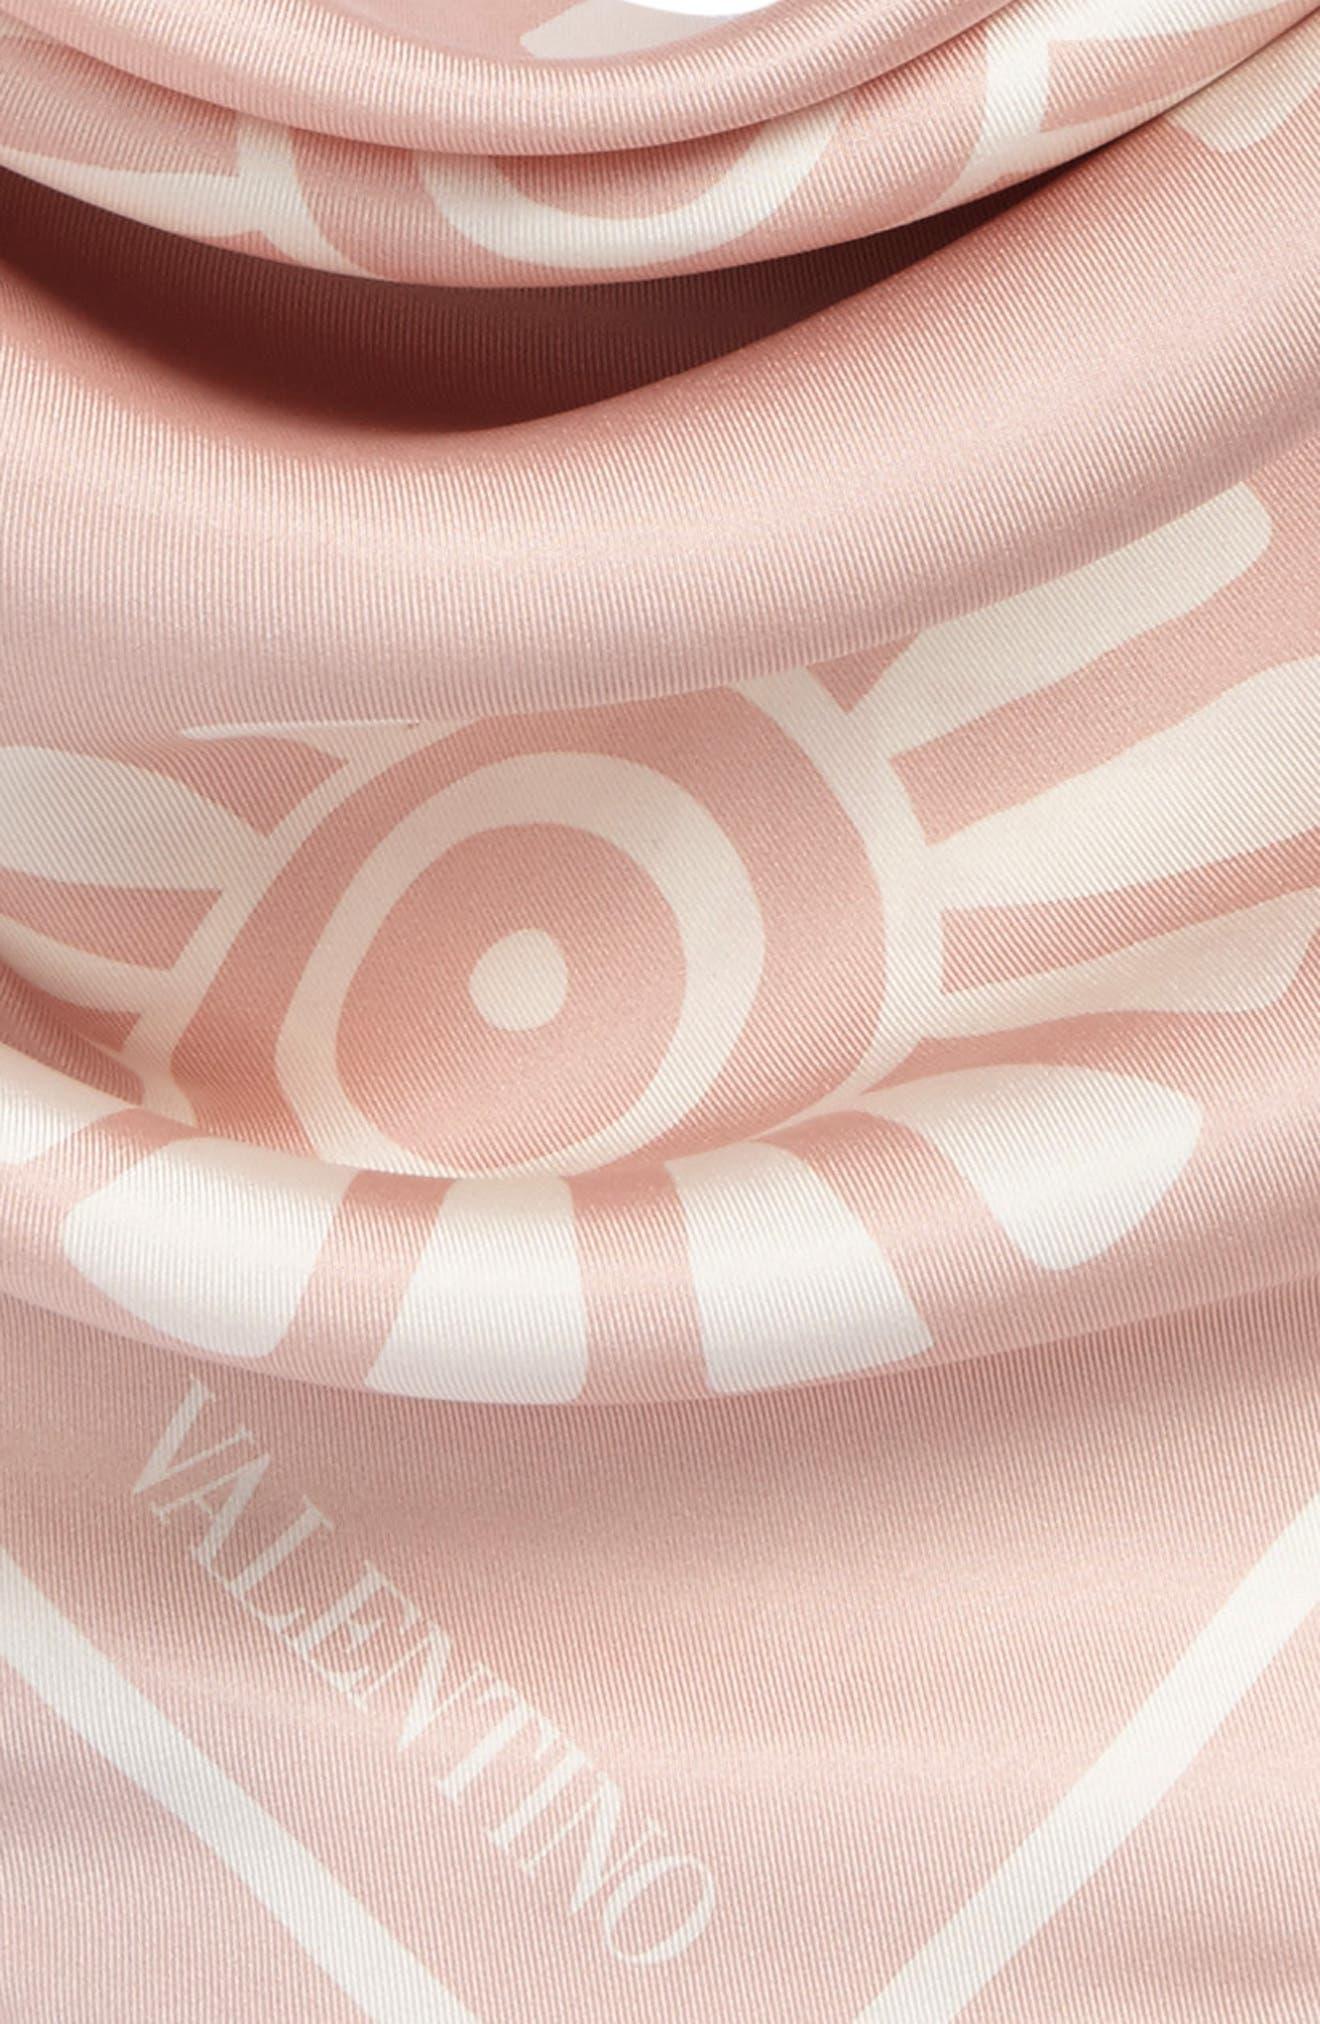 GARAVANI Medallion Print Square Silk Scarf,                             Alternate thumbnail 3, color,                             0Lz Rose Mist